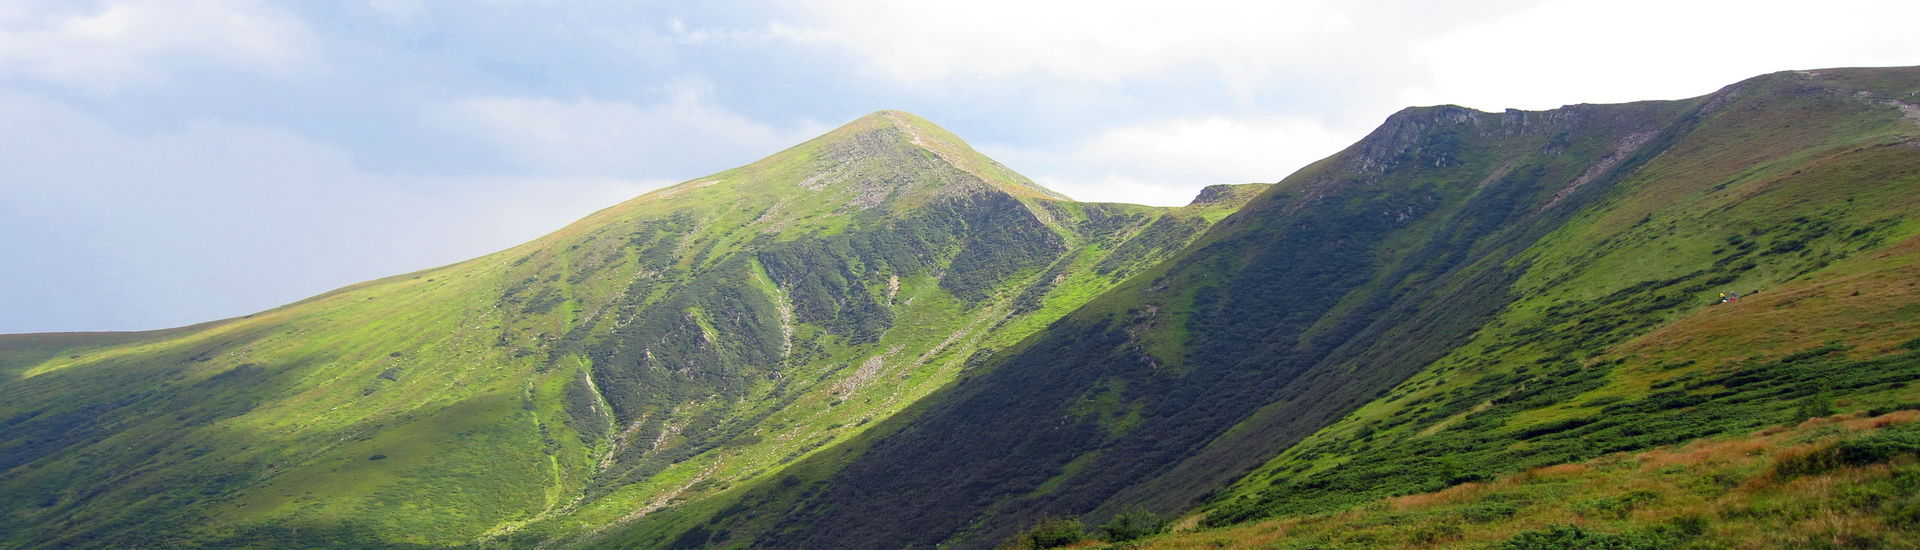 Гора Говерла (2061 м) – найвища вершина України